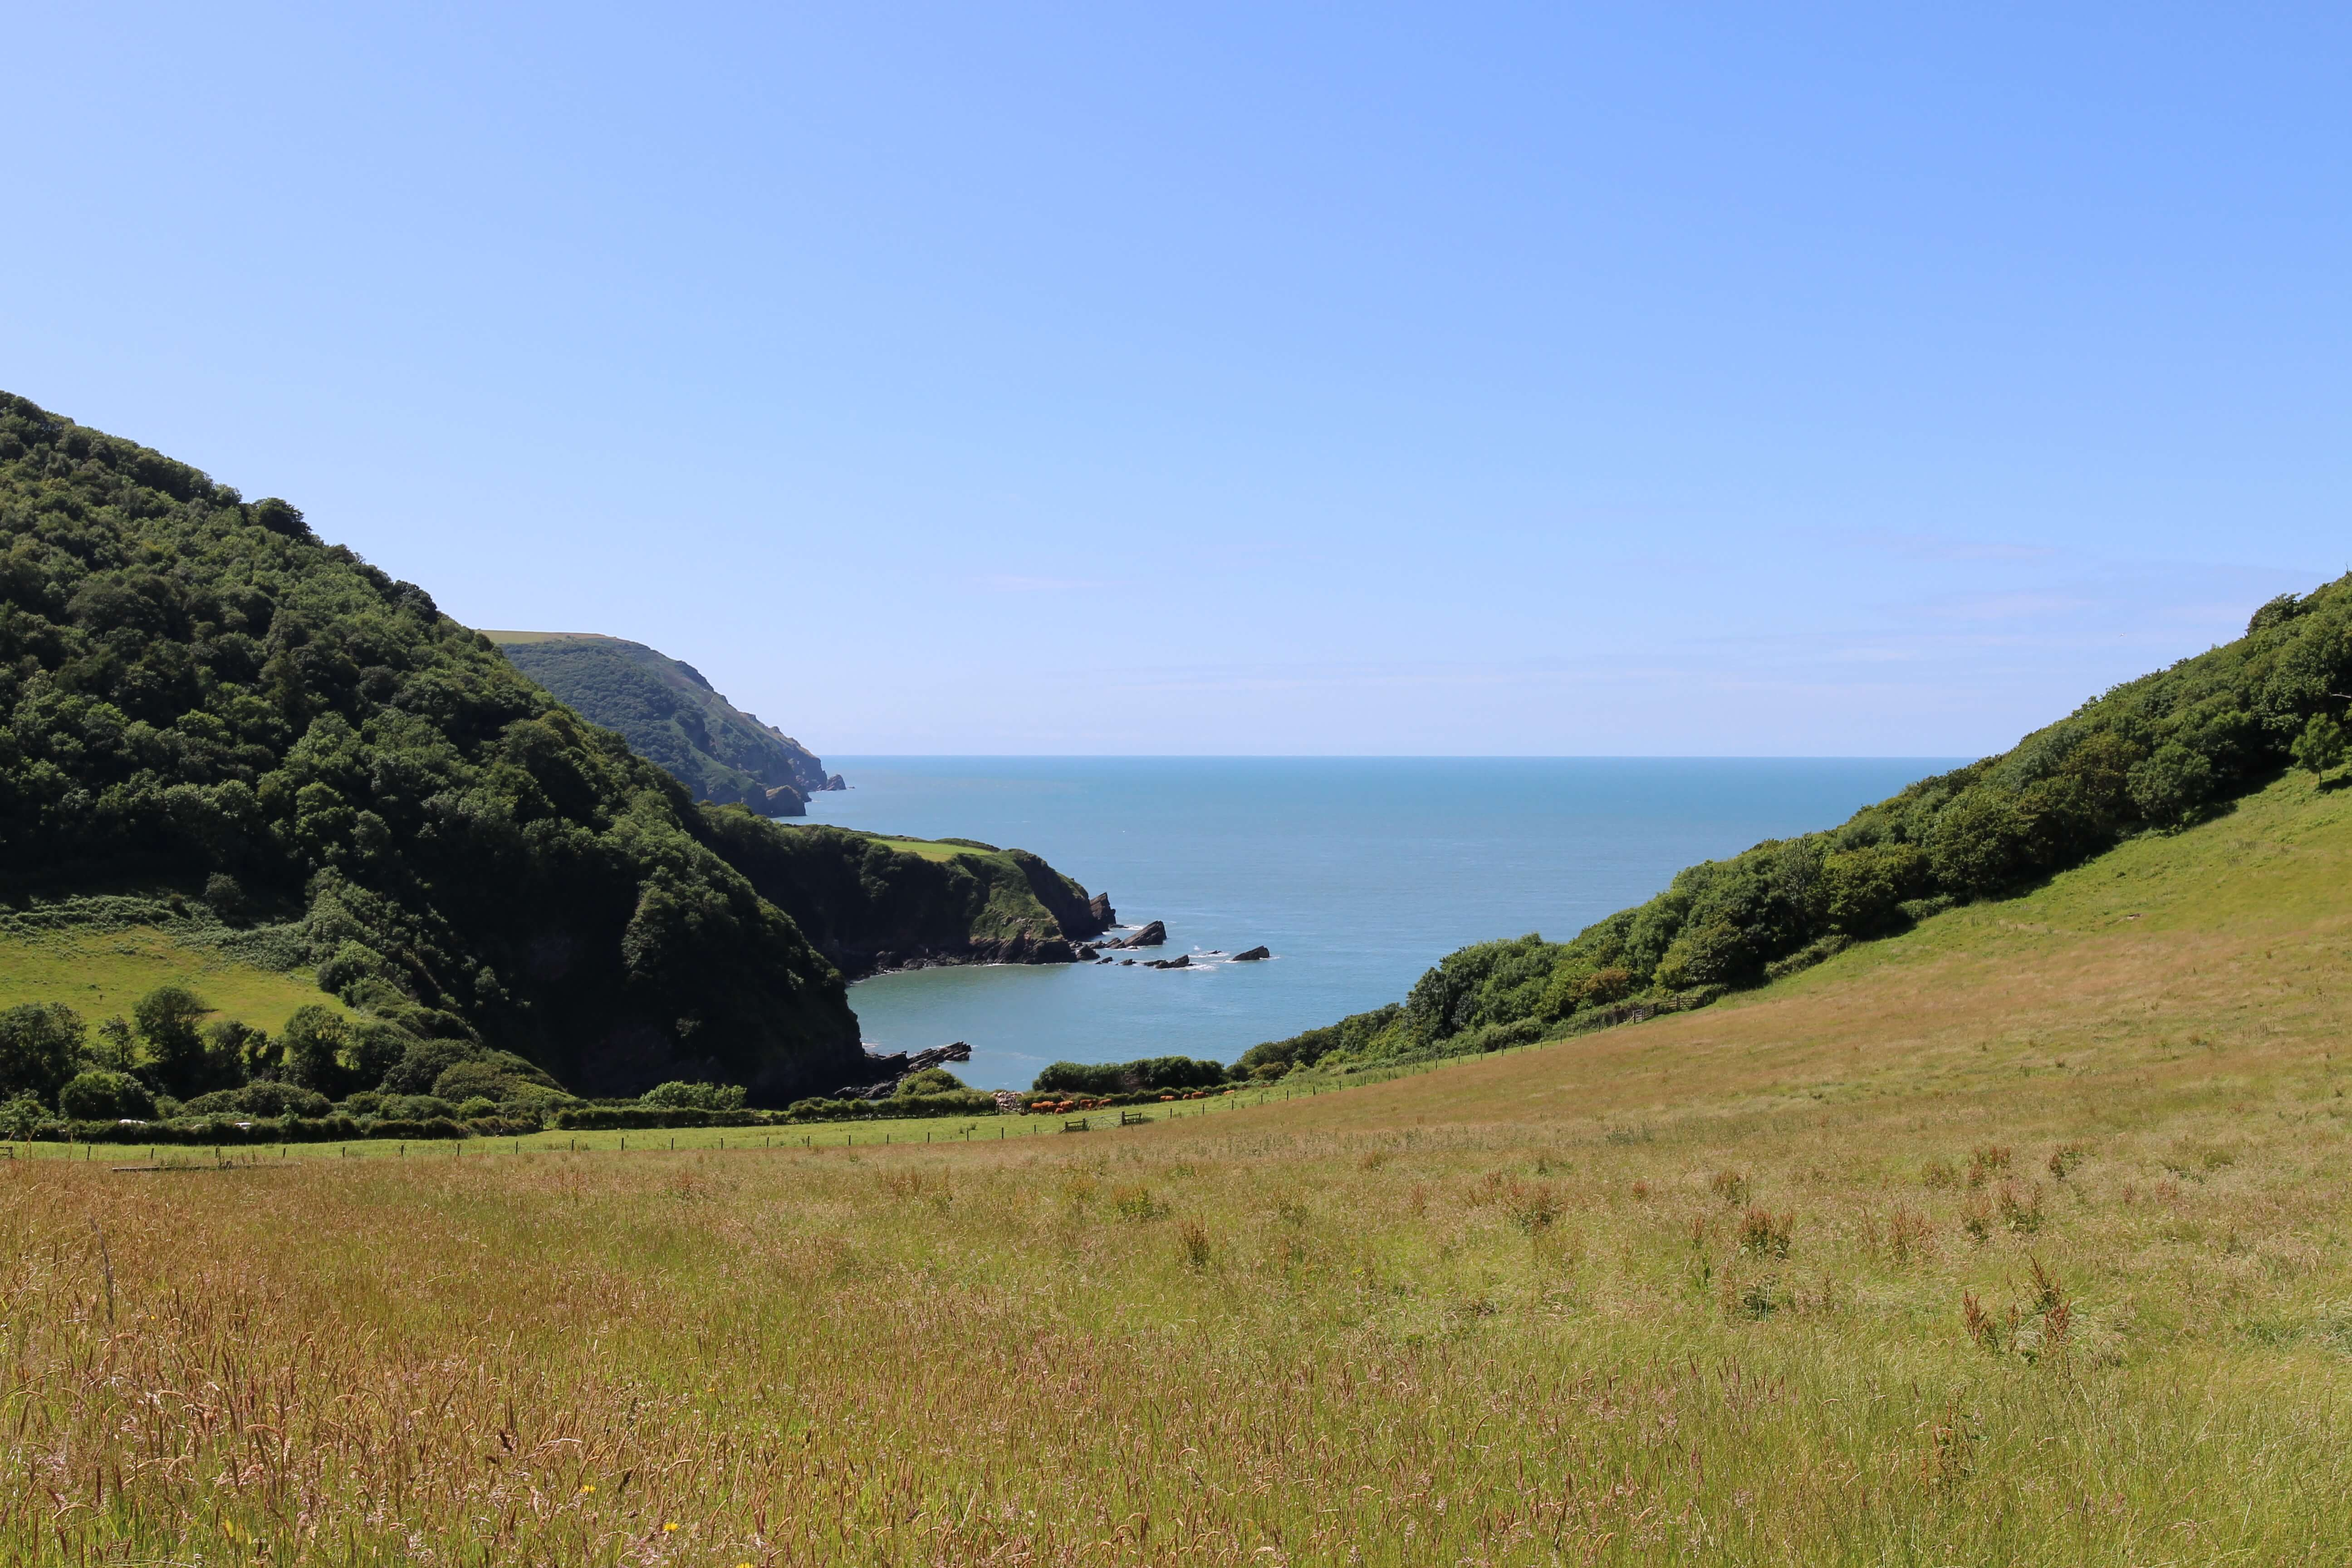 Beautiful view from the coast road heading towards Woody Bay